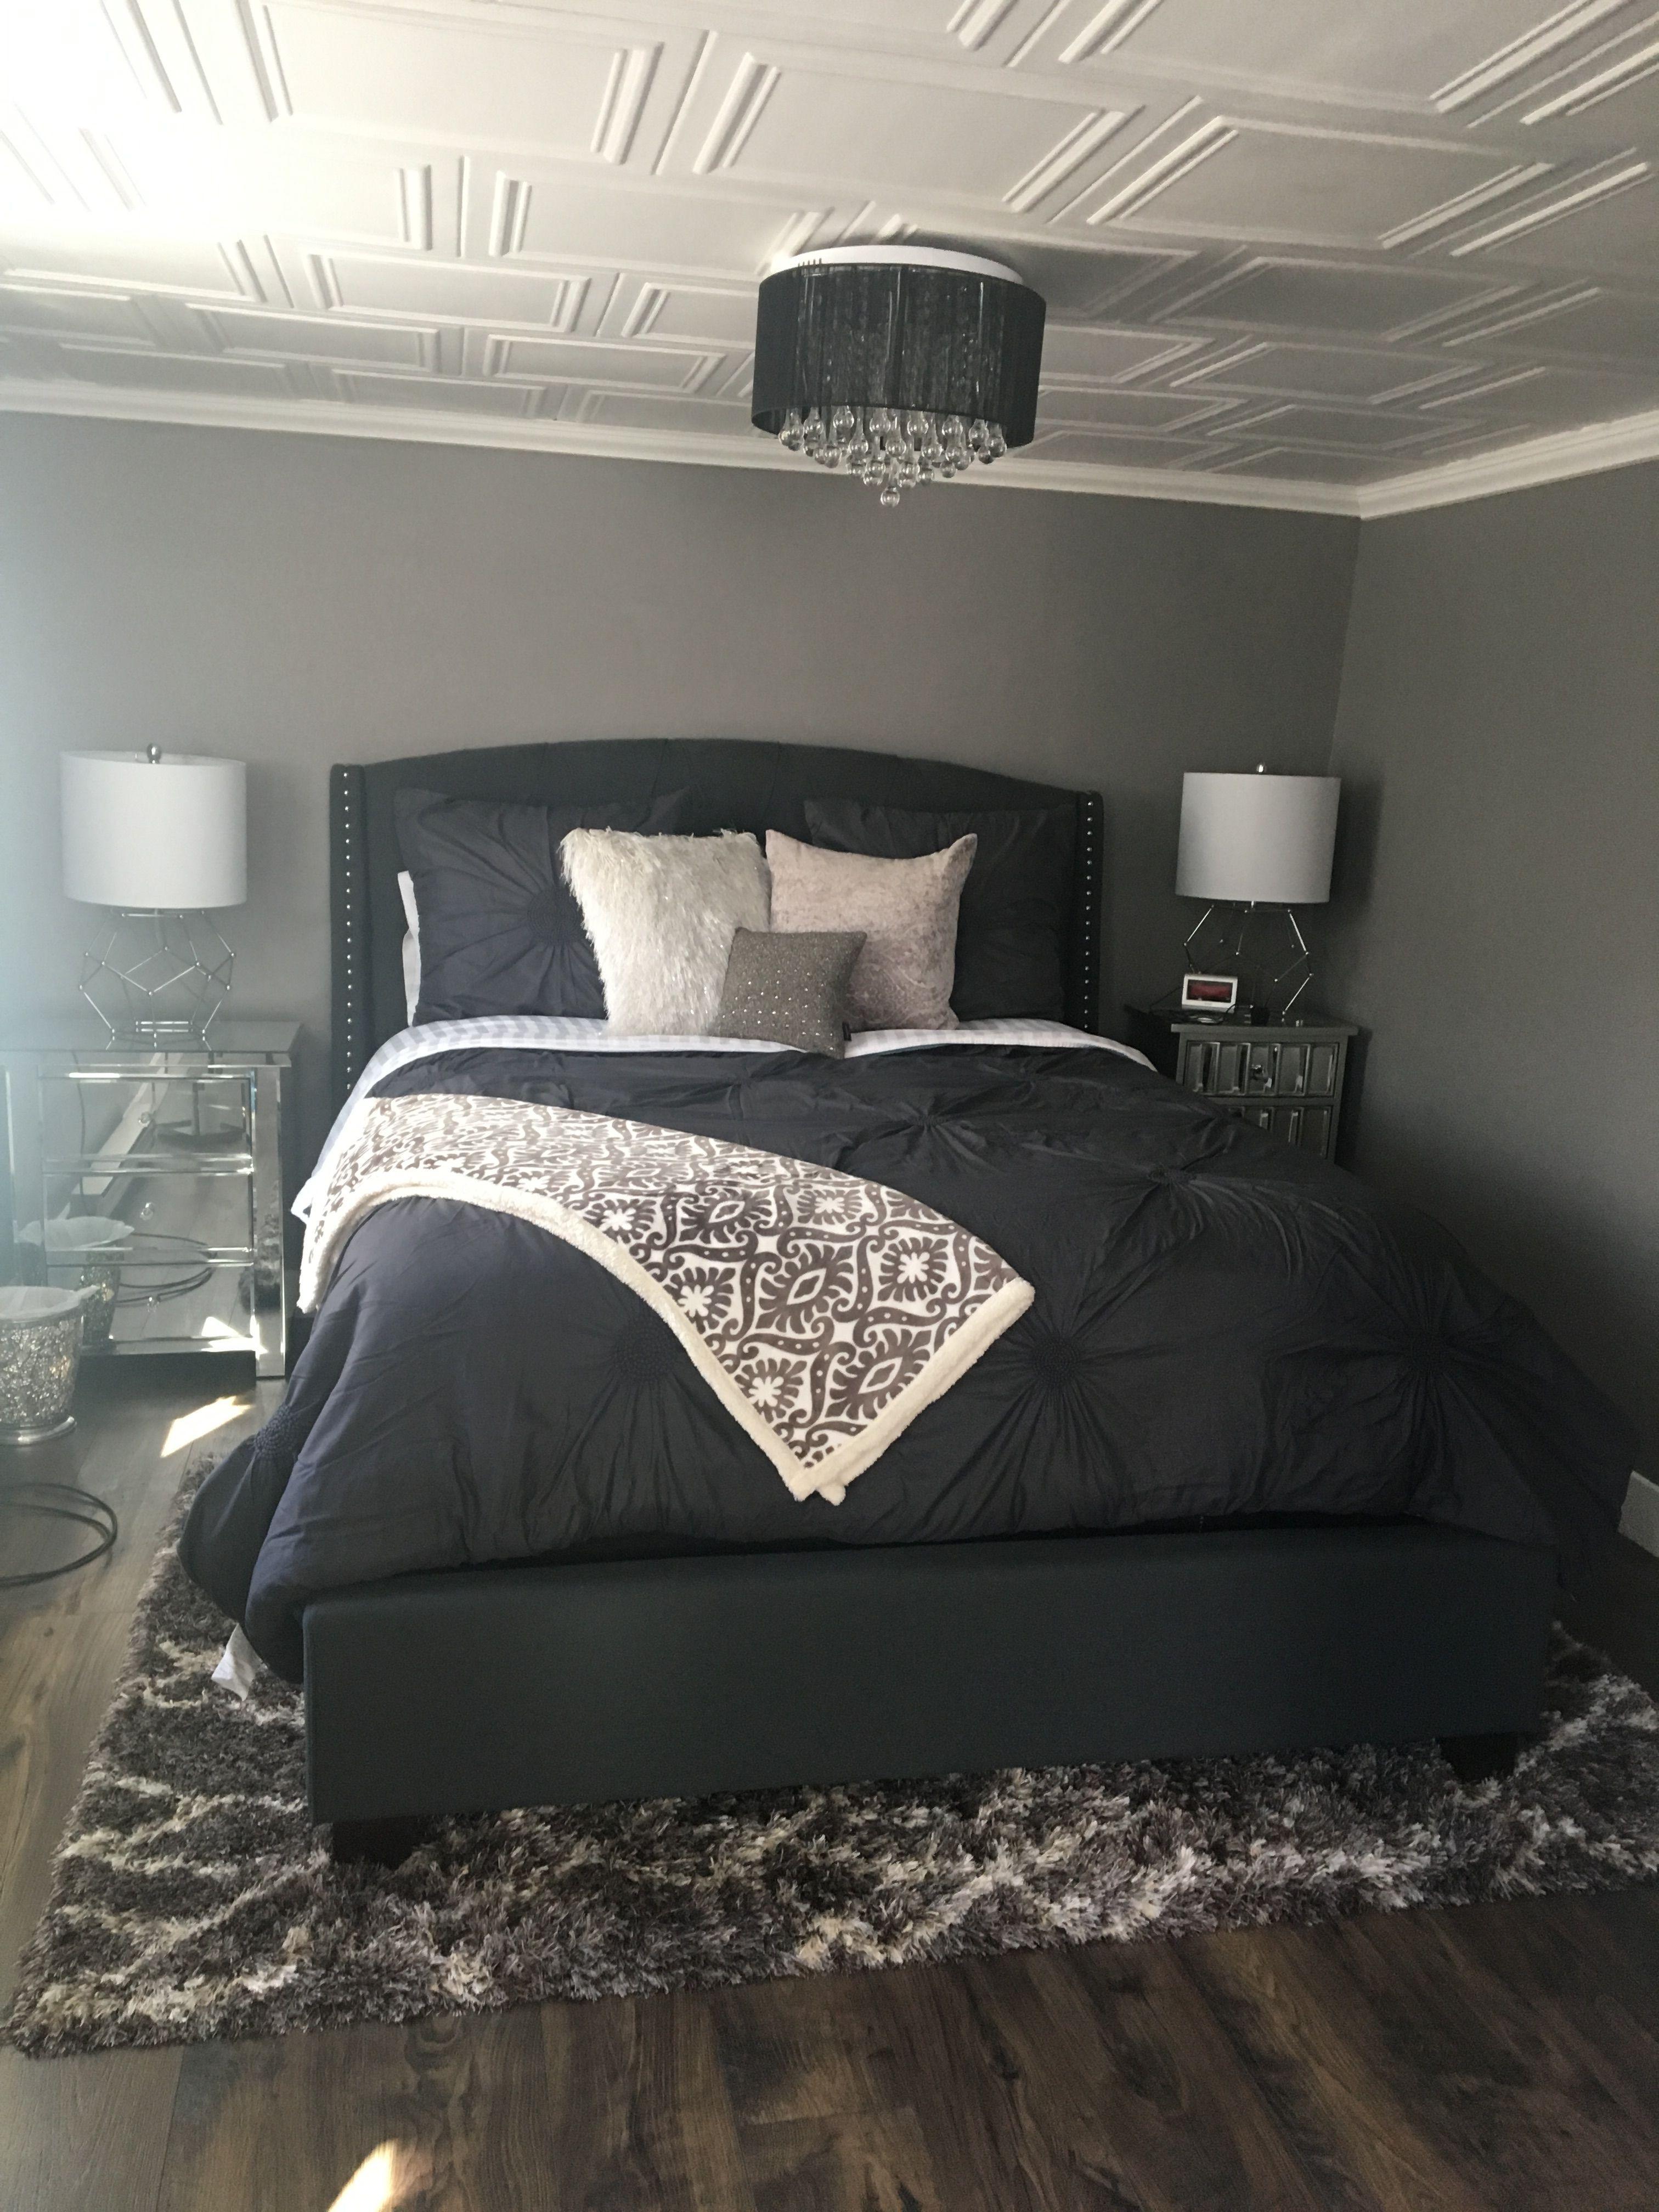 Pin by Julie Glenn on Farm Small basement bedroom